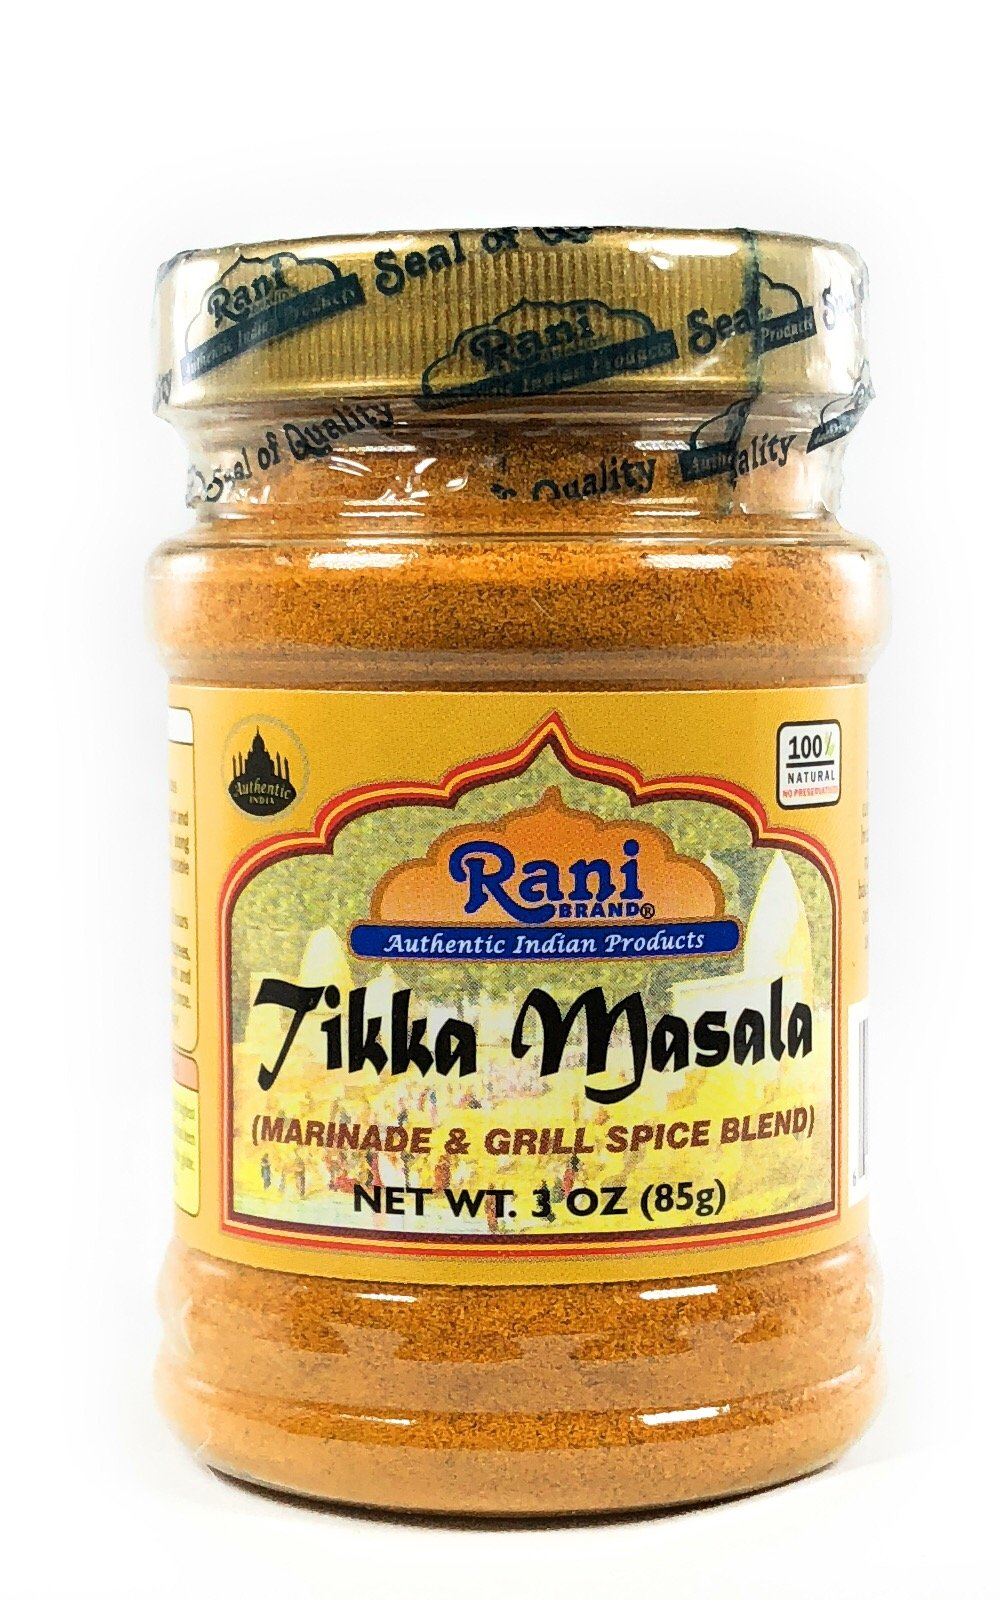 Rani Tikka Masala Indian 10-Spice Blend 3oz (85g) ~ Natural, Salt-Free | Vegan | No Colors | Gluten Free Ingredients | NON-GMO